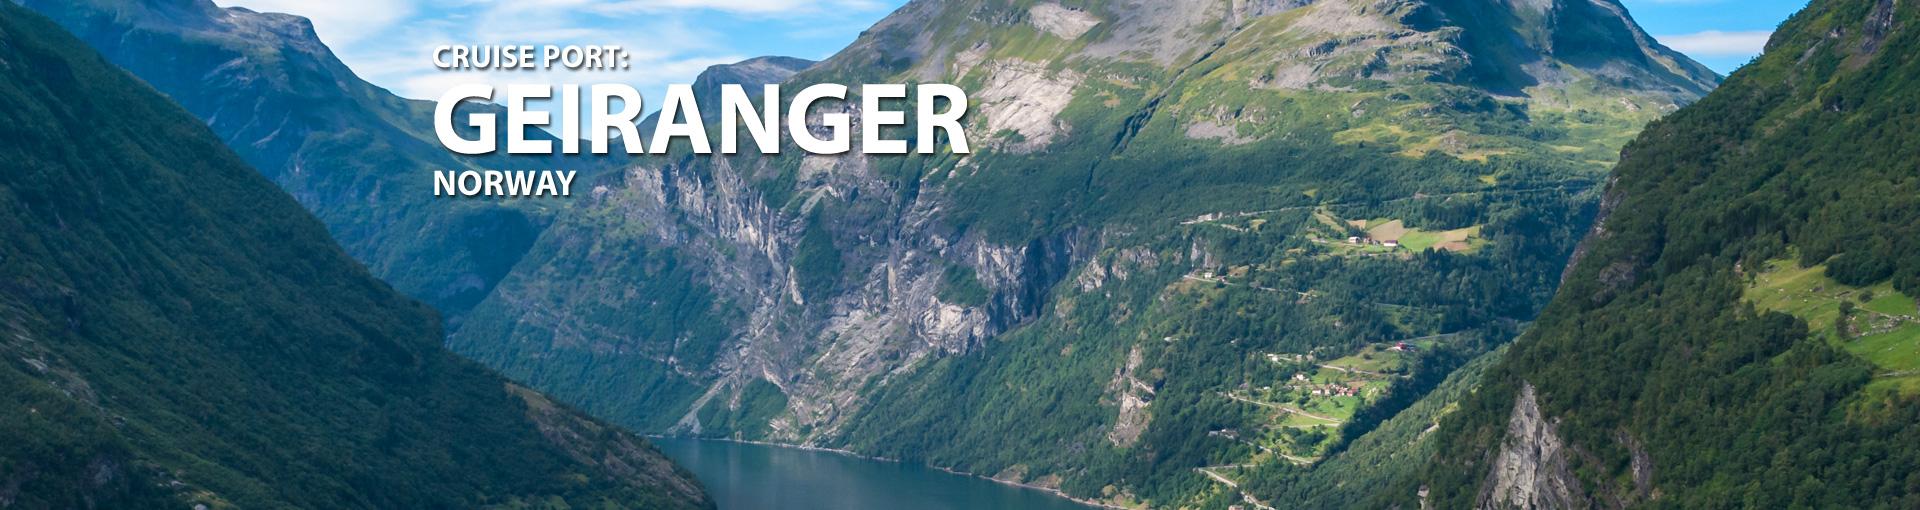 Cruises to Geiranger, Norway